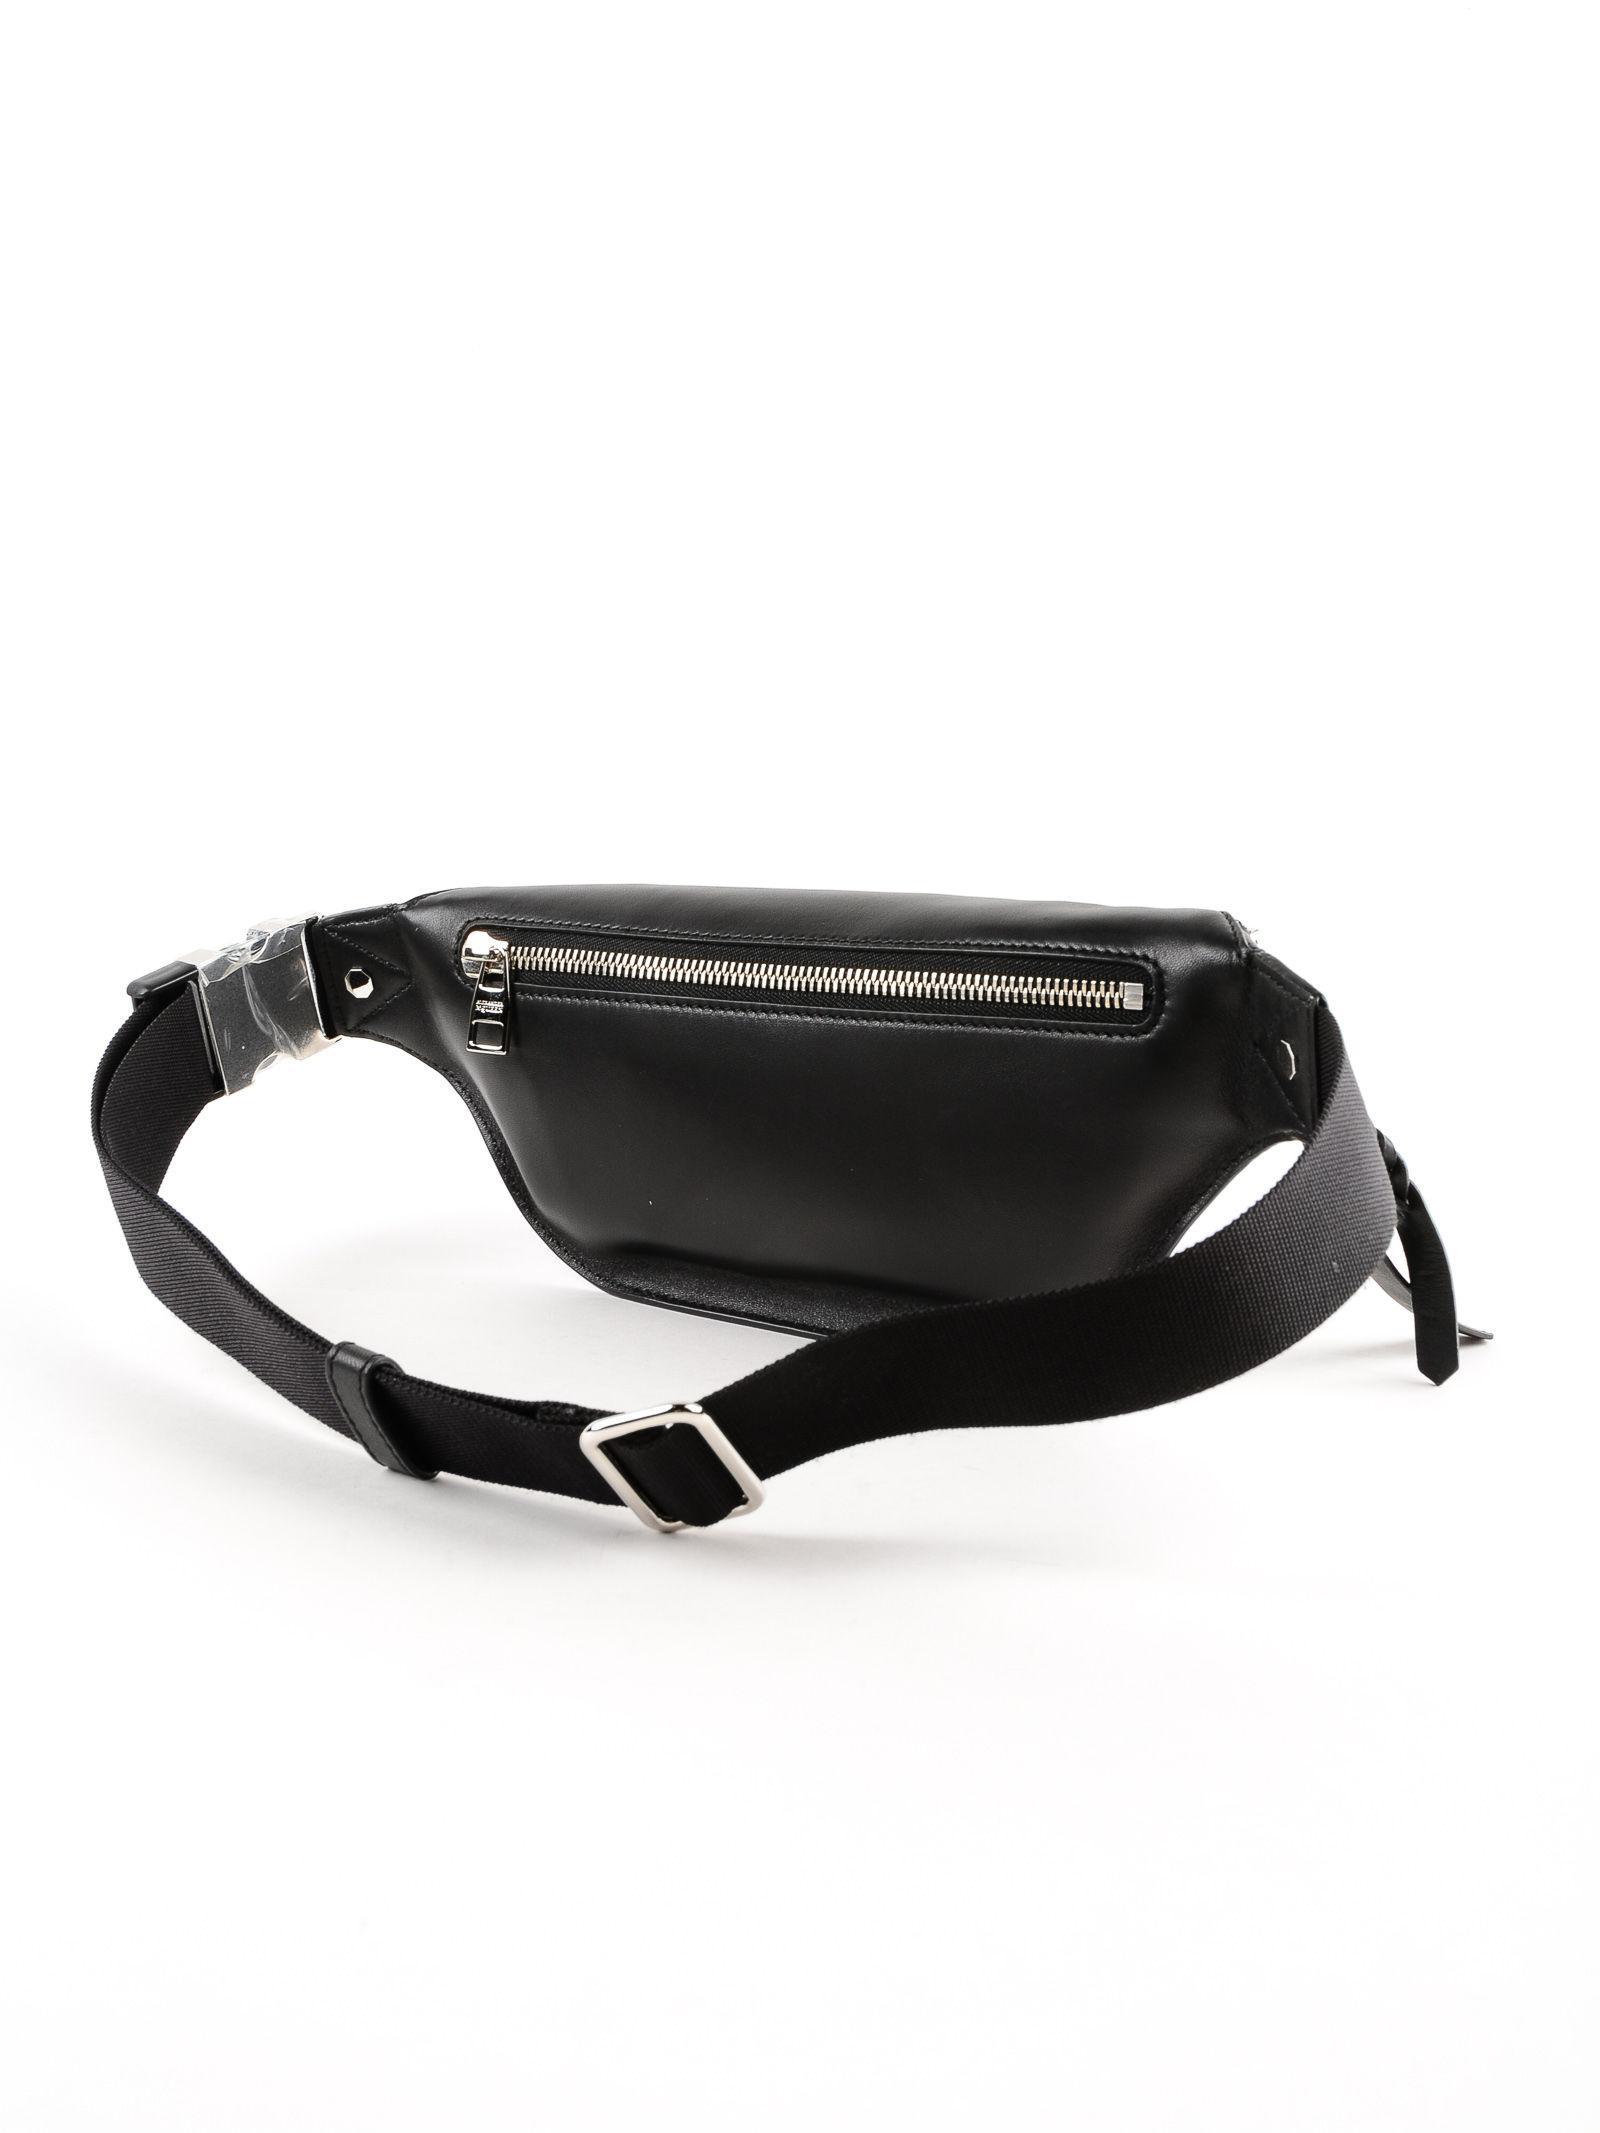 6a129541a7 Alexander McQueen Harness Leather Belt Bag in Black for Men - Lyst